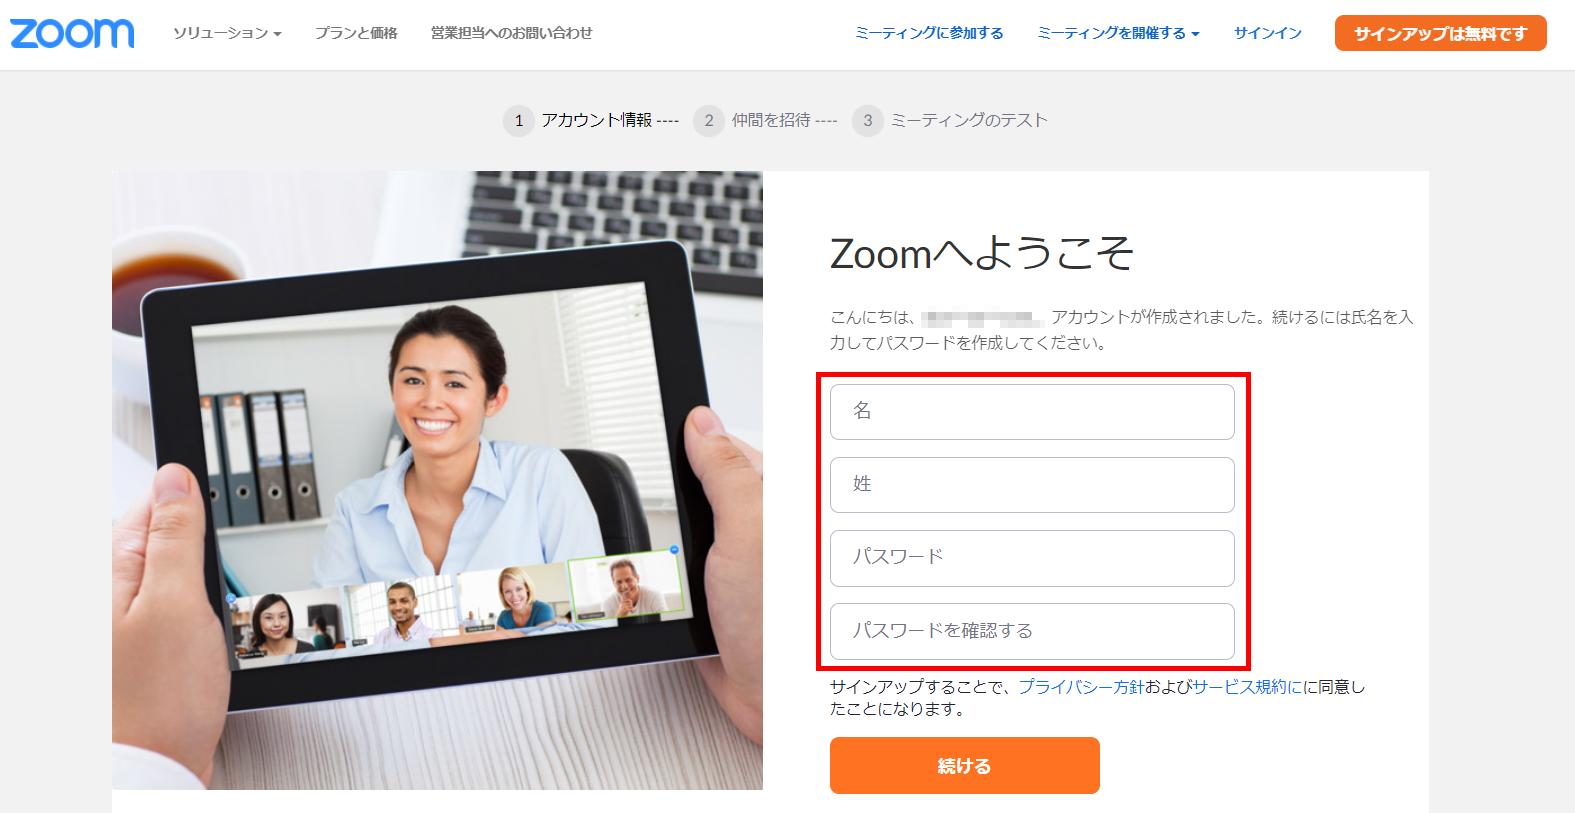 Zoomのアカウントを作成する方法7